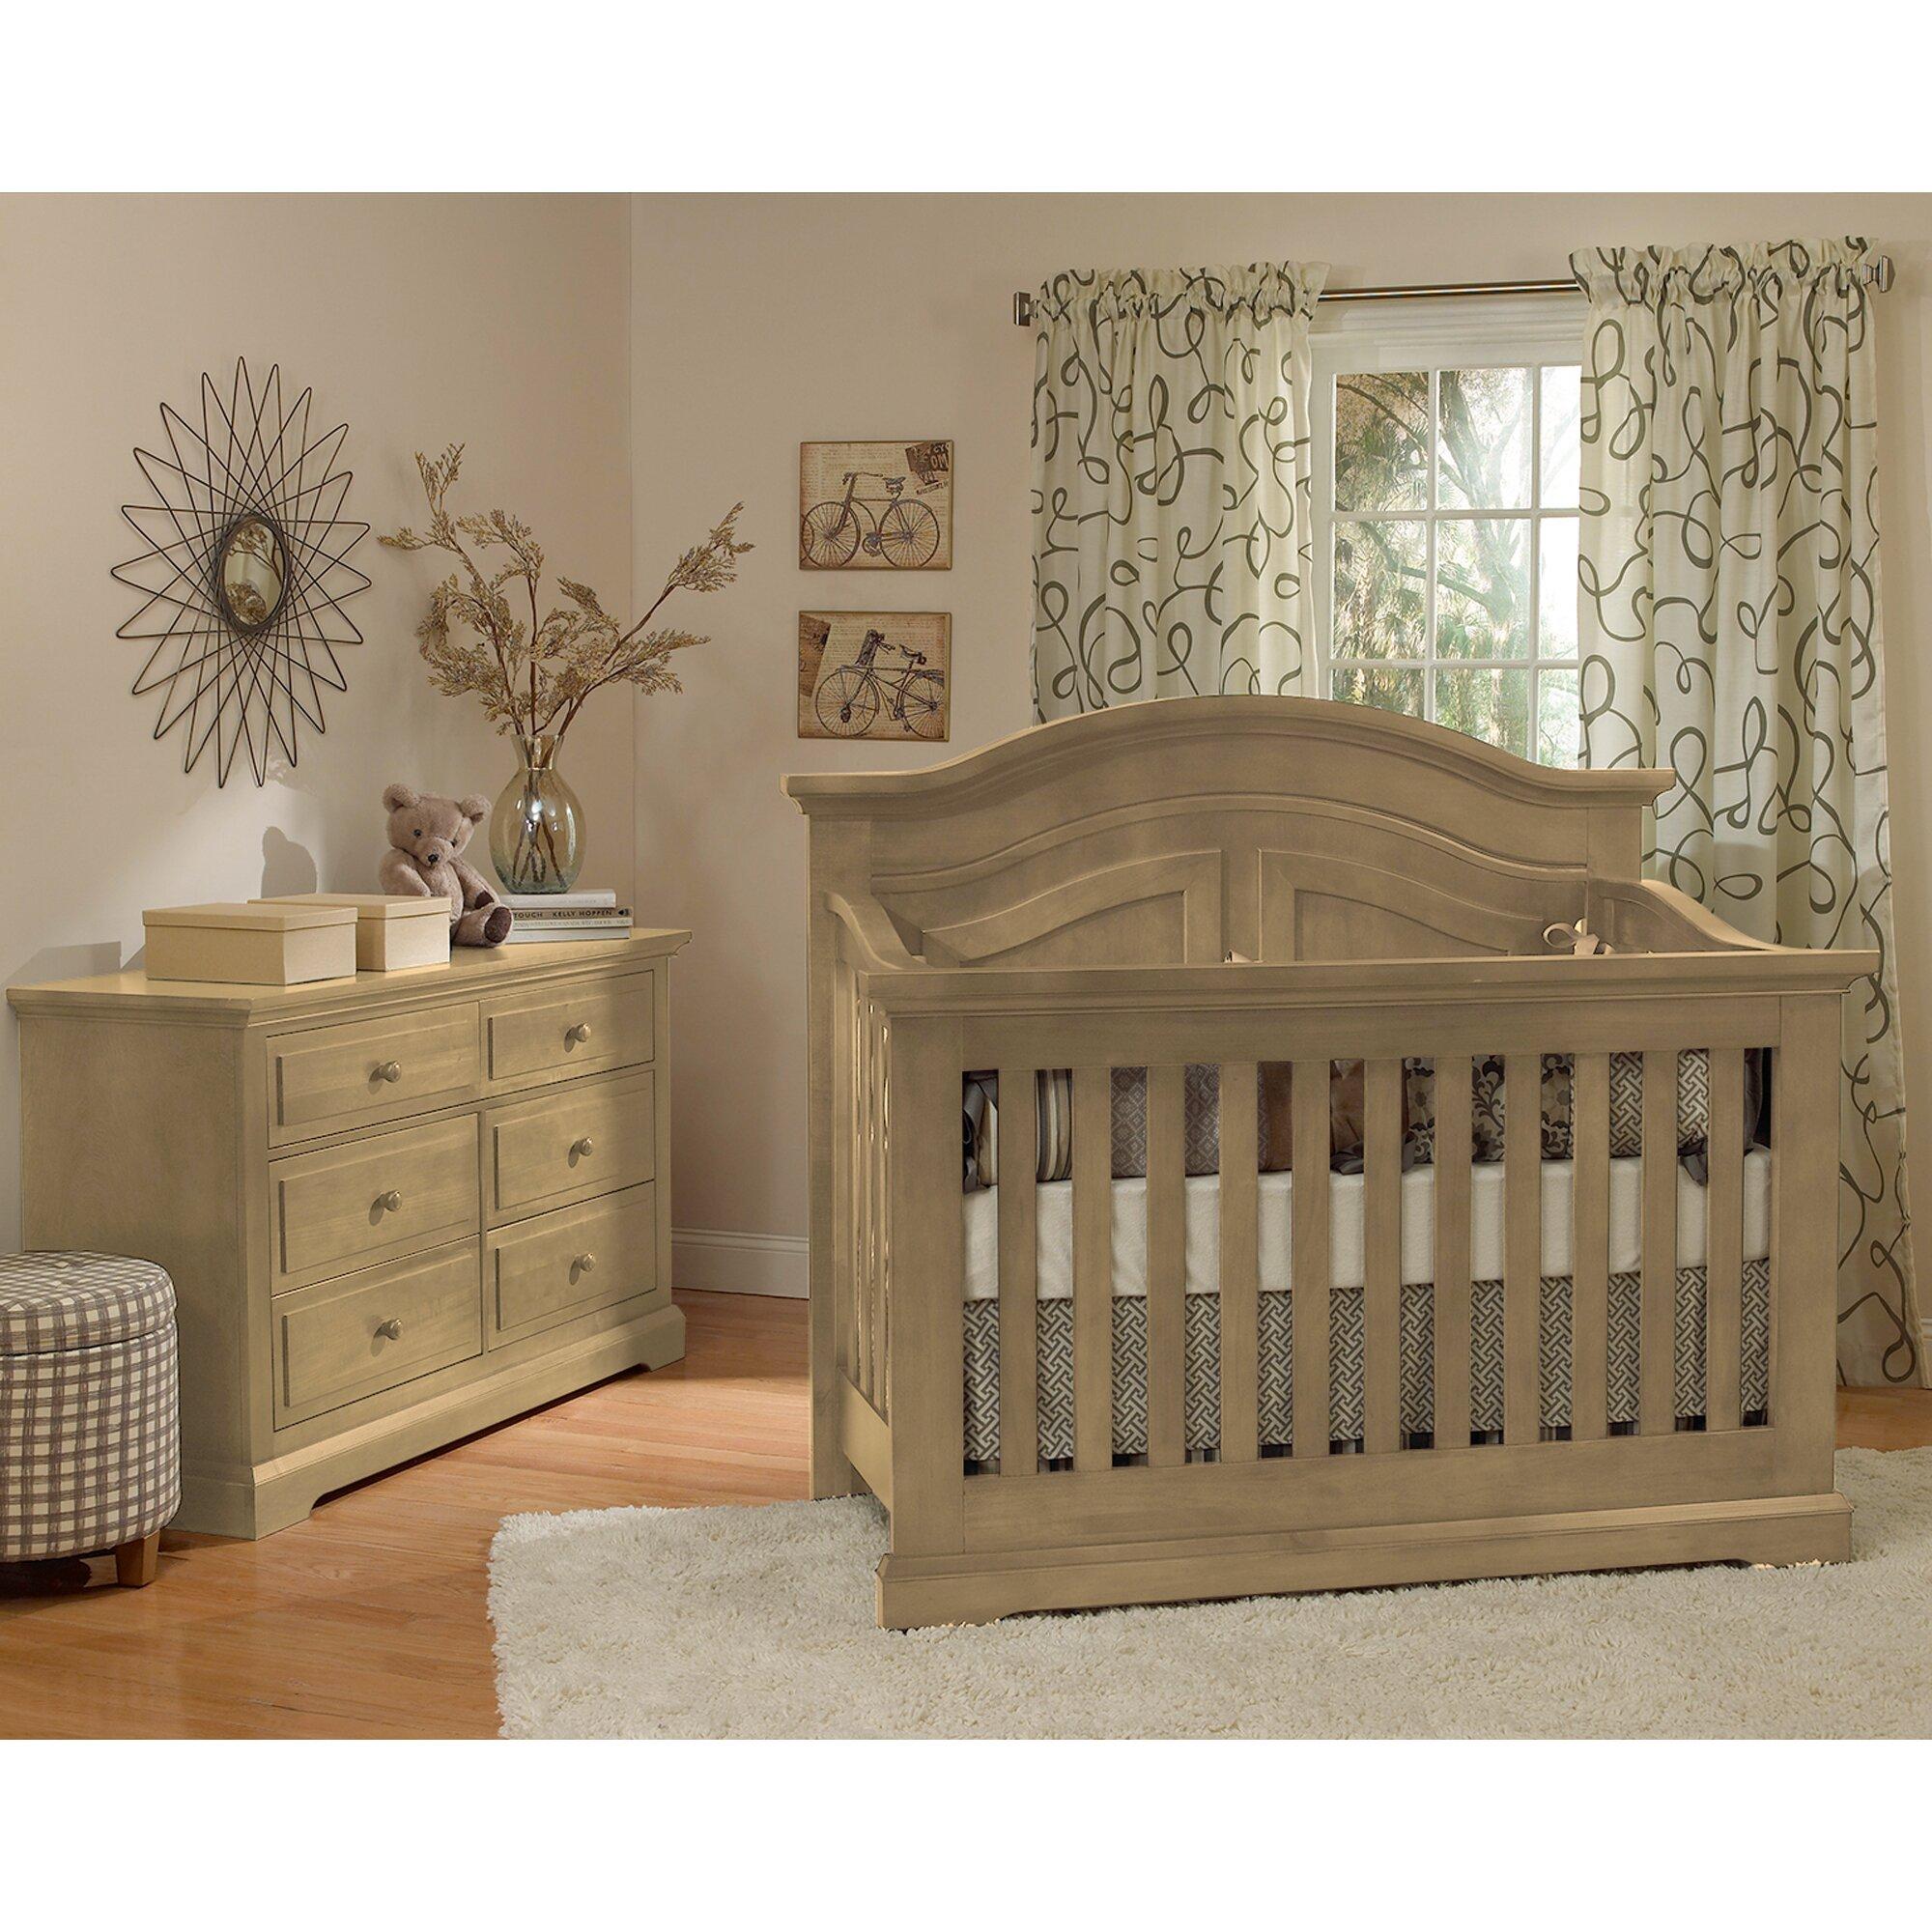 Munir 233 Furniture Chatham Curved Top Convertible Crib